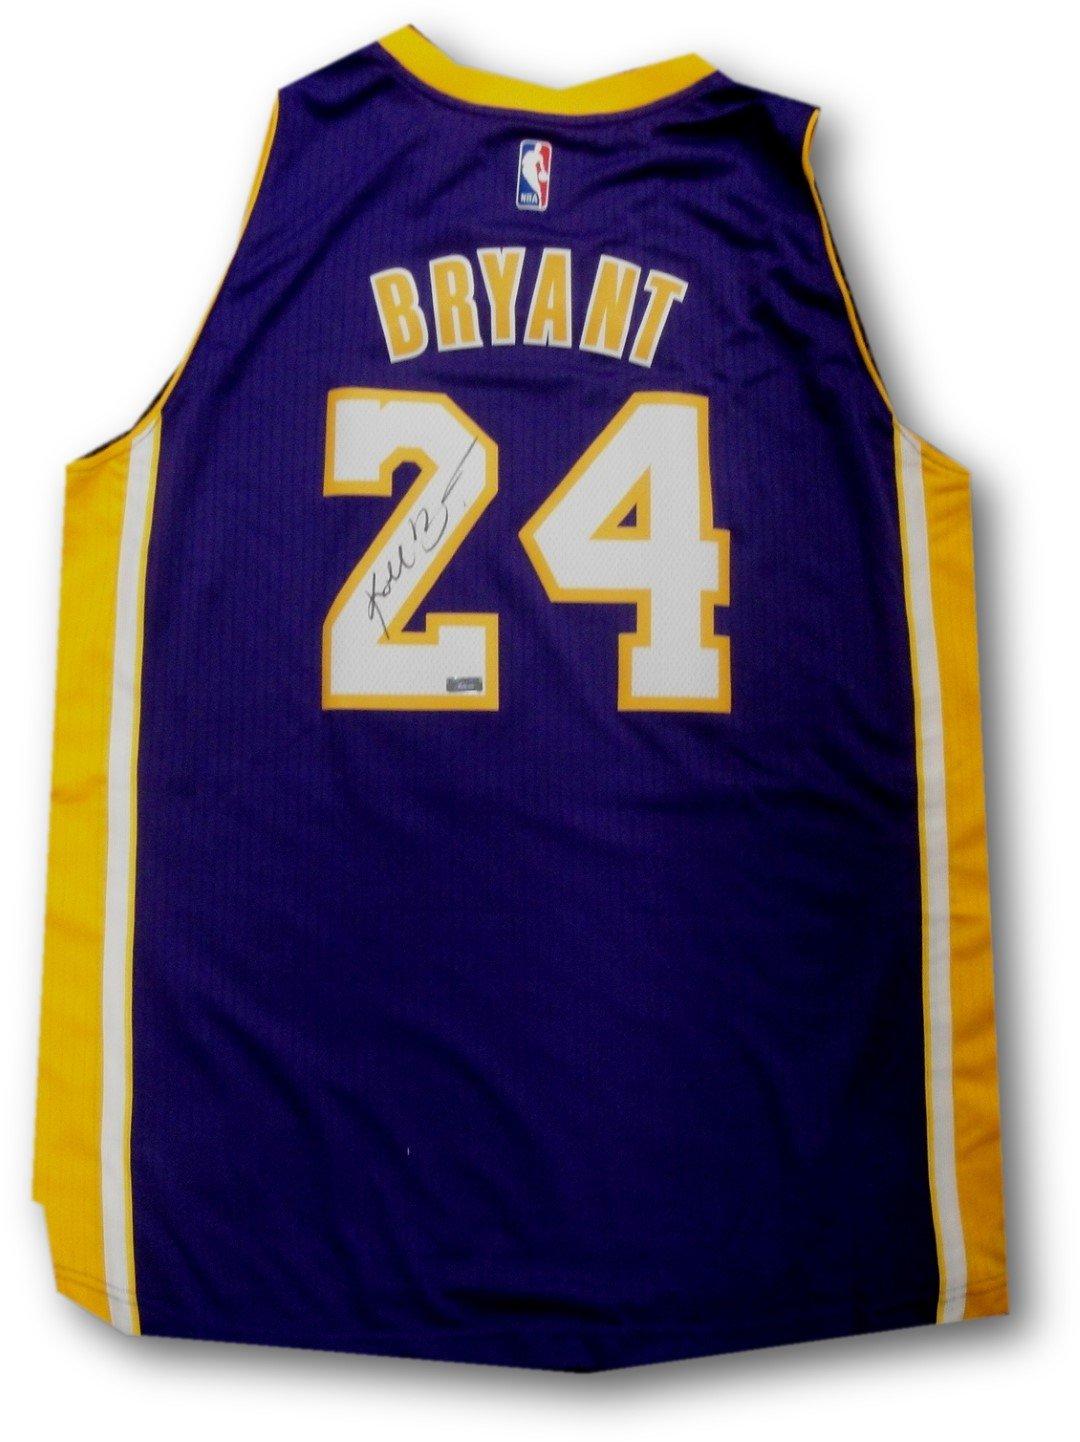 new style cfb62 40220 Kobe Bryant Hand Signed Autographed Swingman Jersey Purple ...